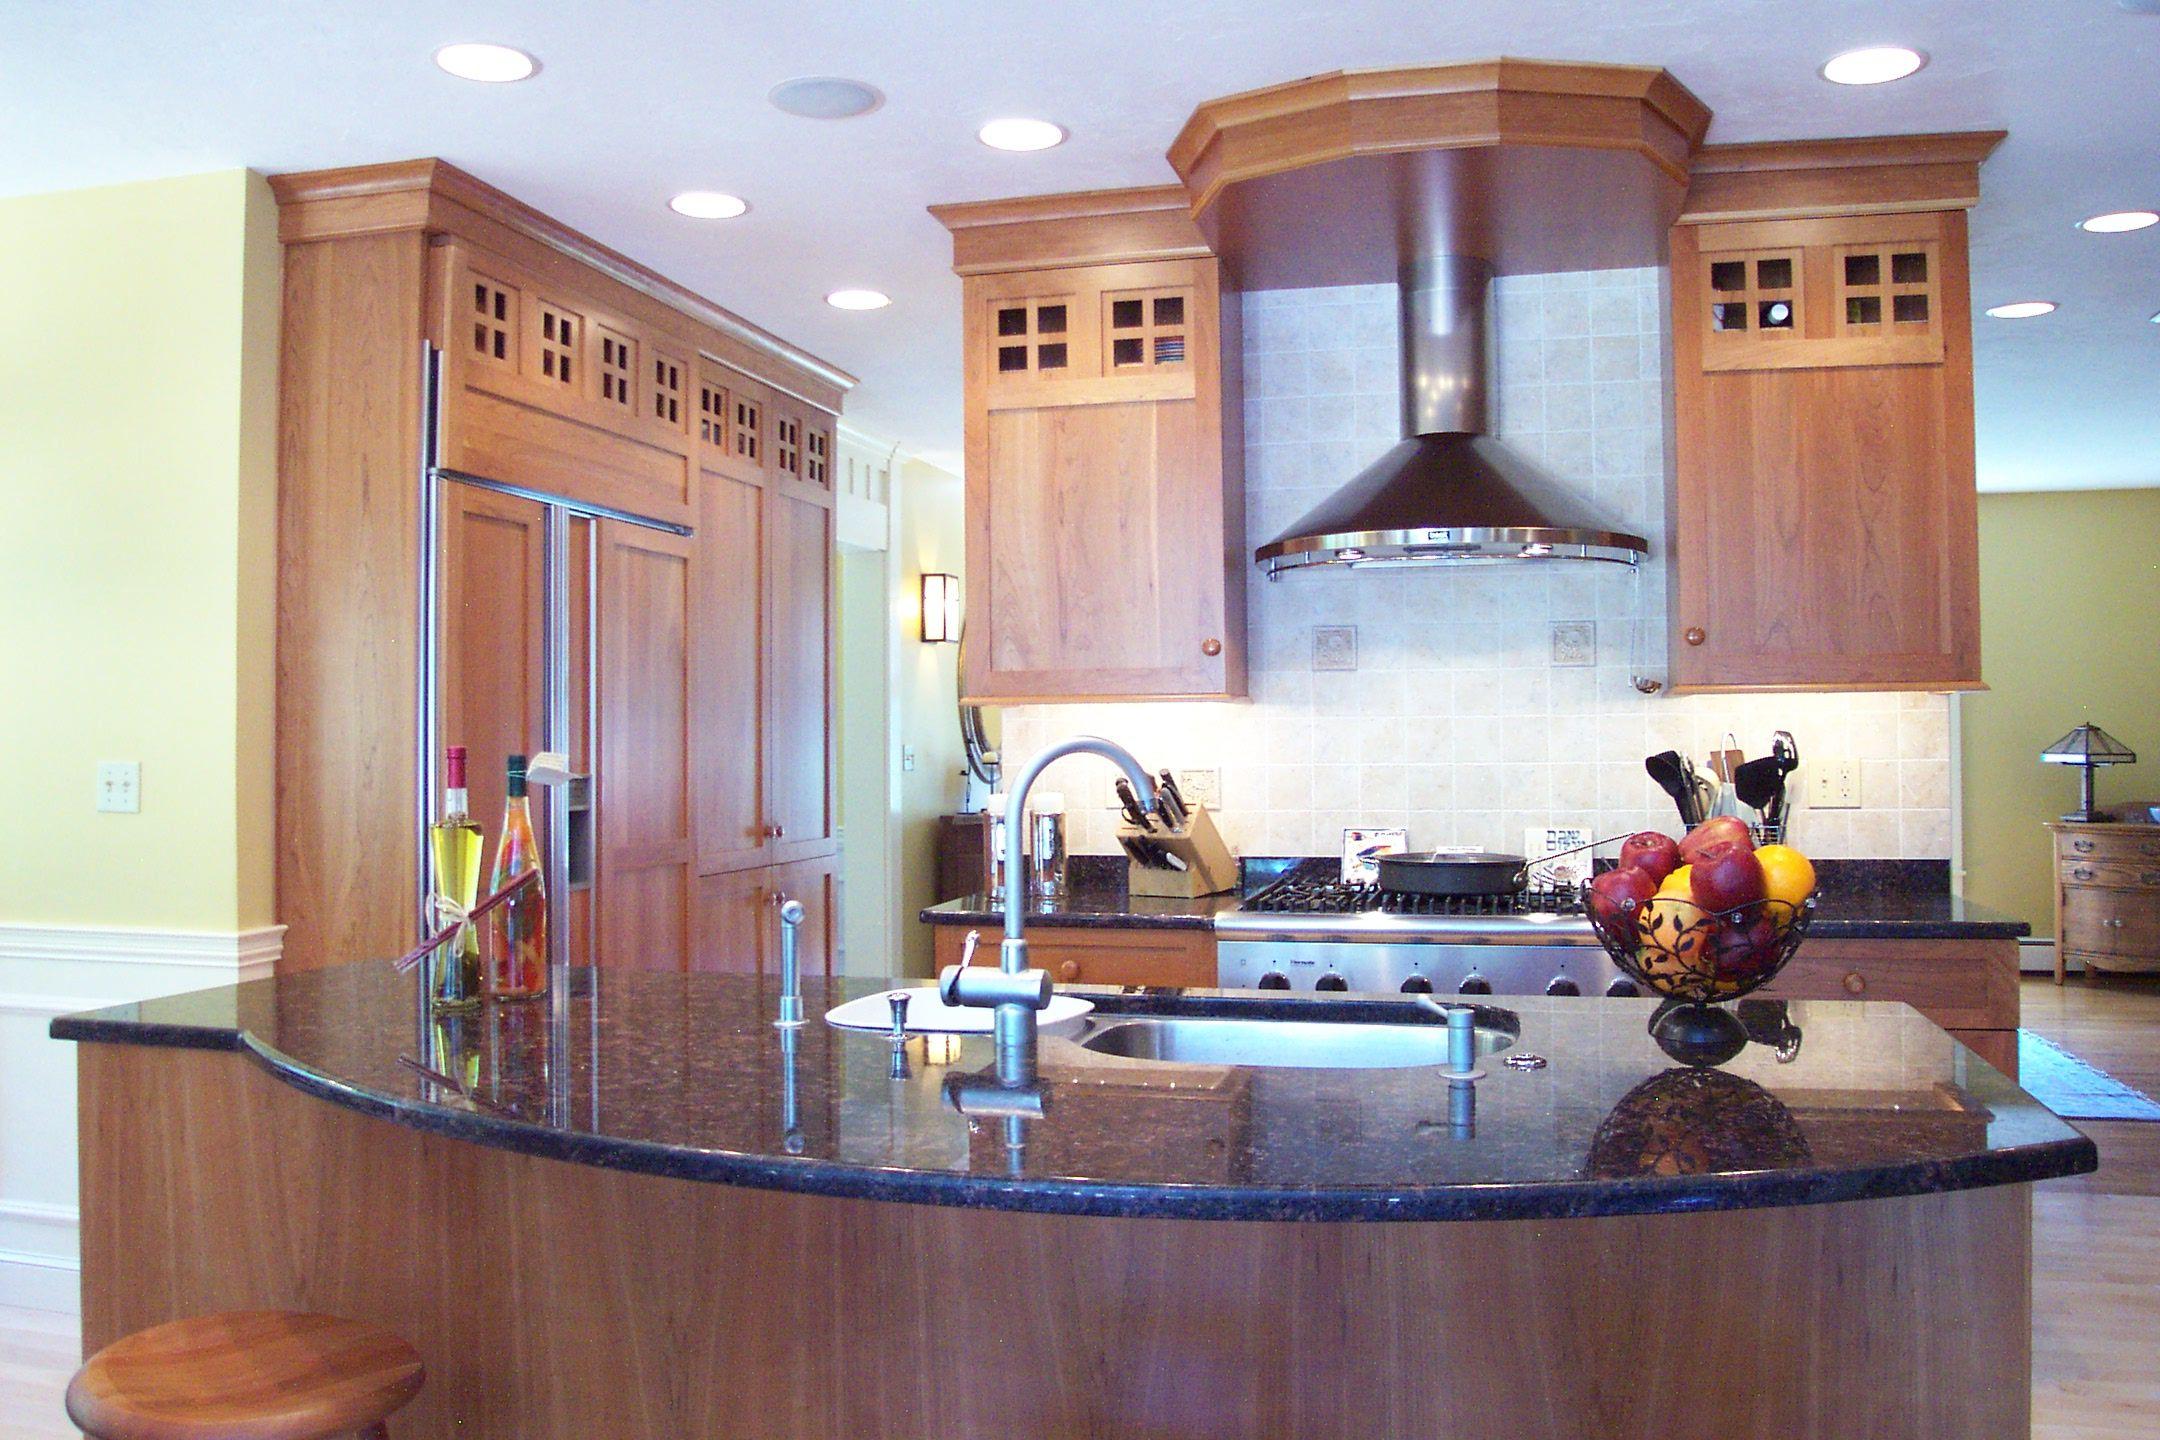 Transitional kitchen stainless steel appliances island sink built